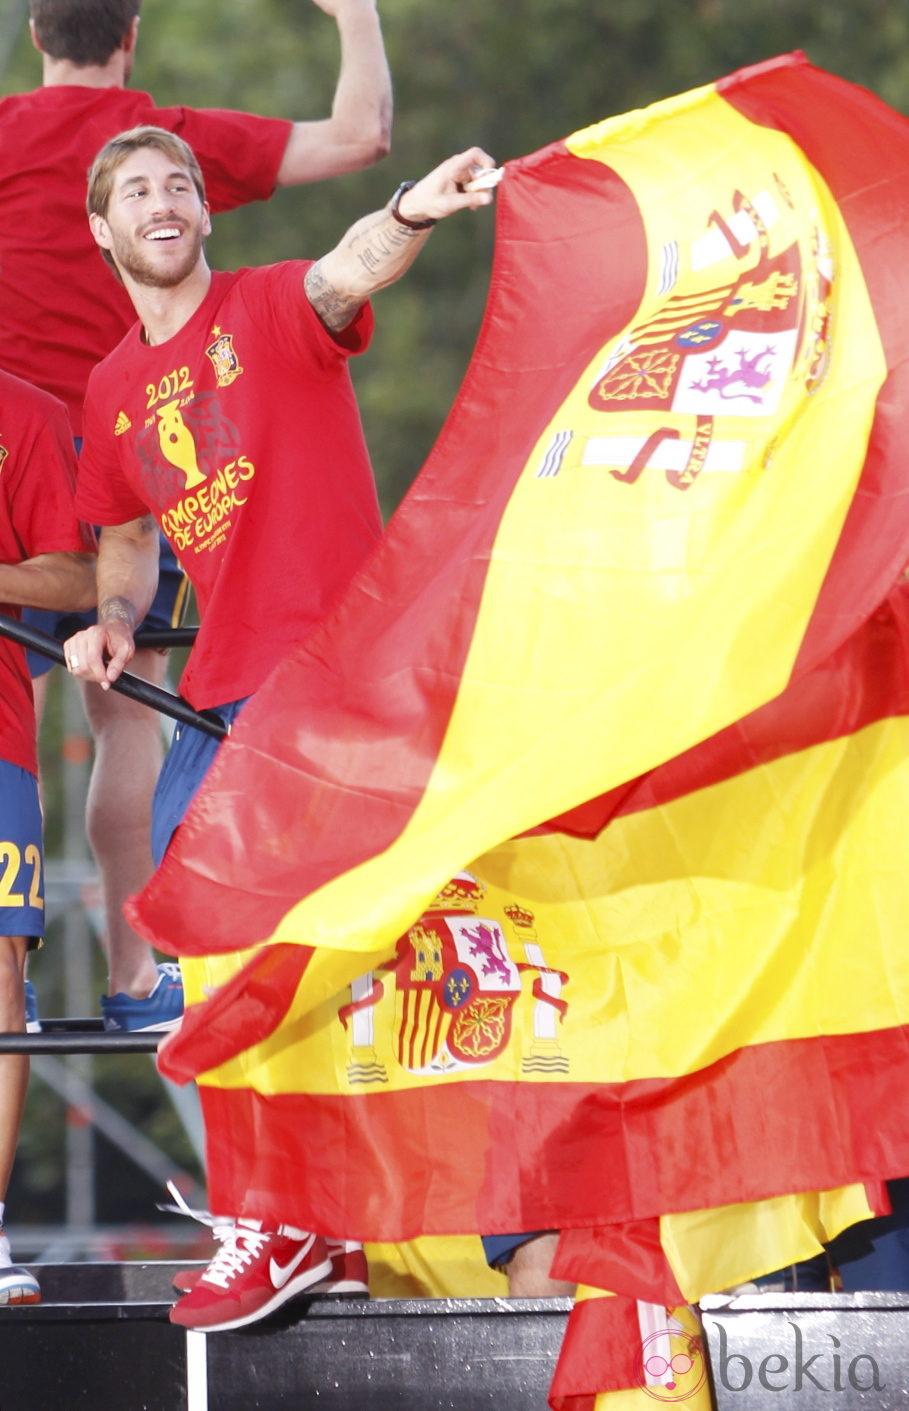 Eurocopa 2012  24340_sergio-ramos-agita-bandera-celebracion-madrid-eurocopa-2012